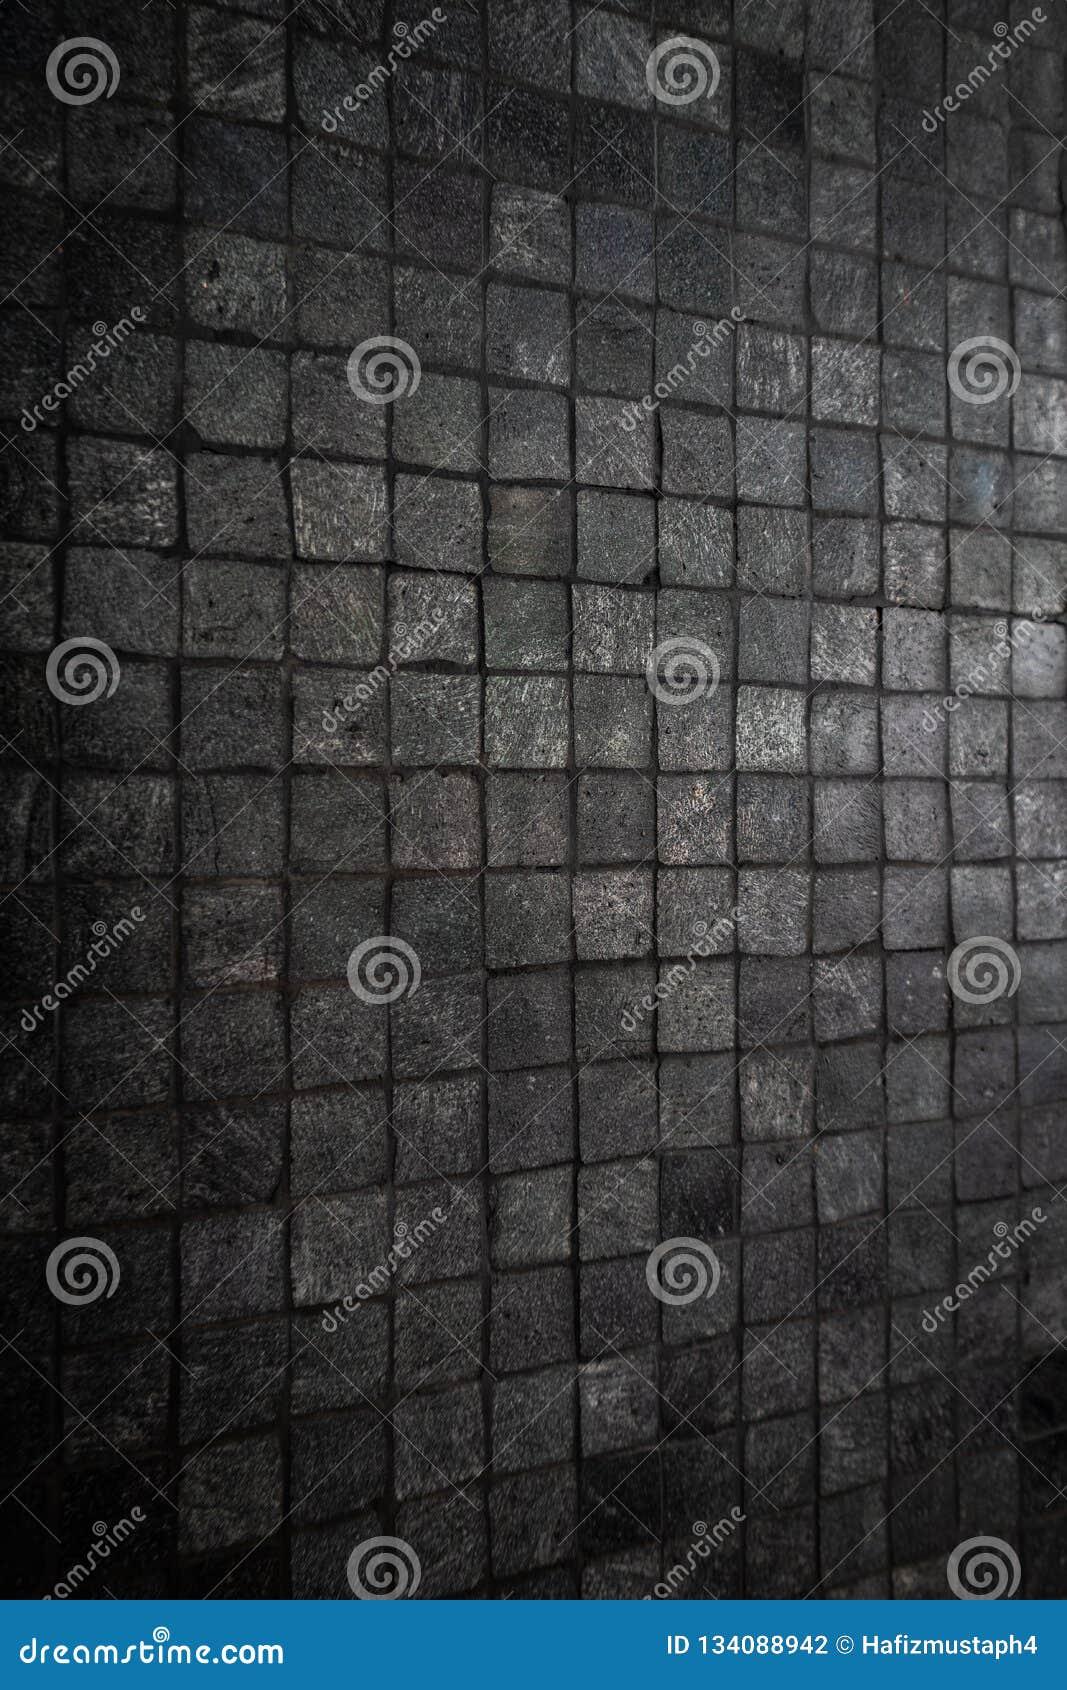 Rough dark grey mosaic tiles wall column